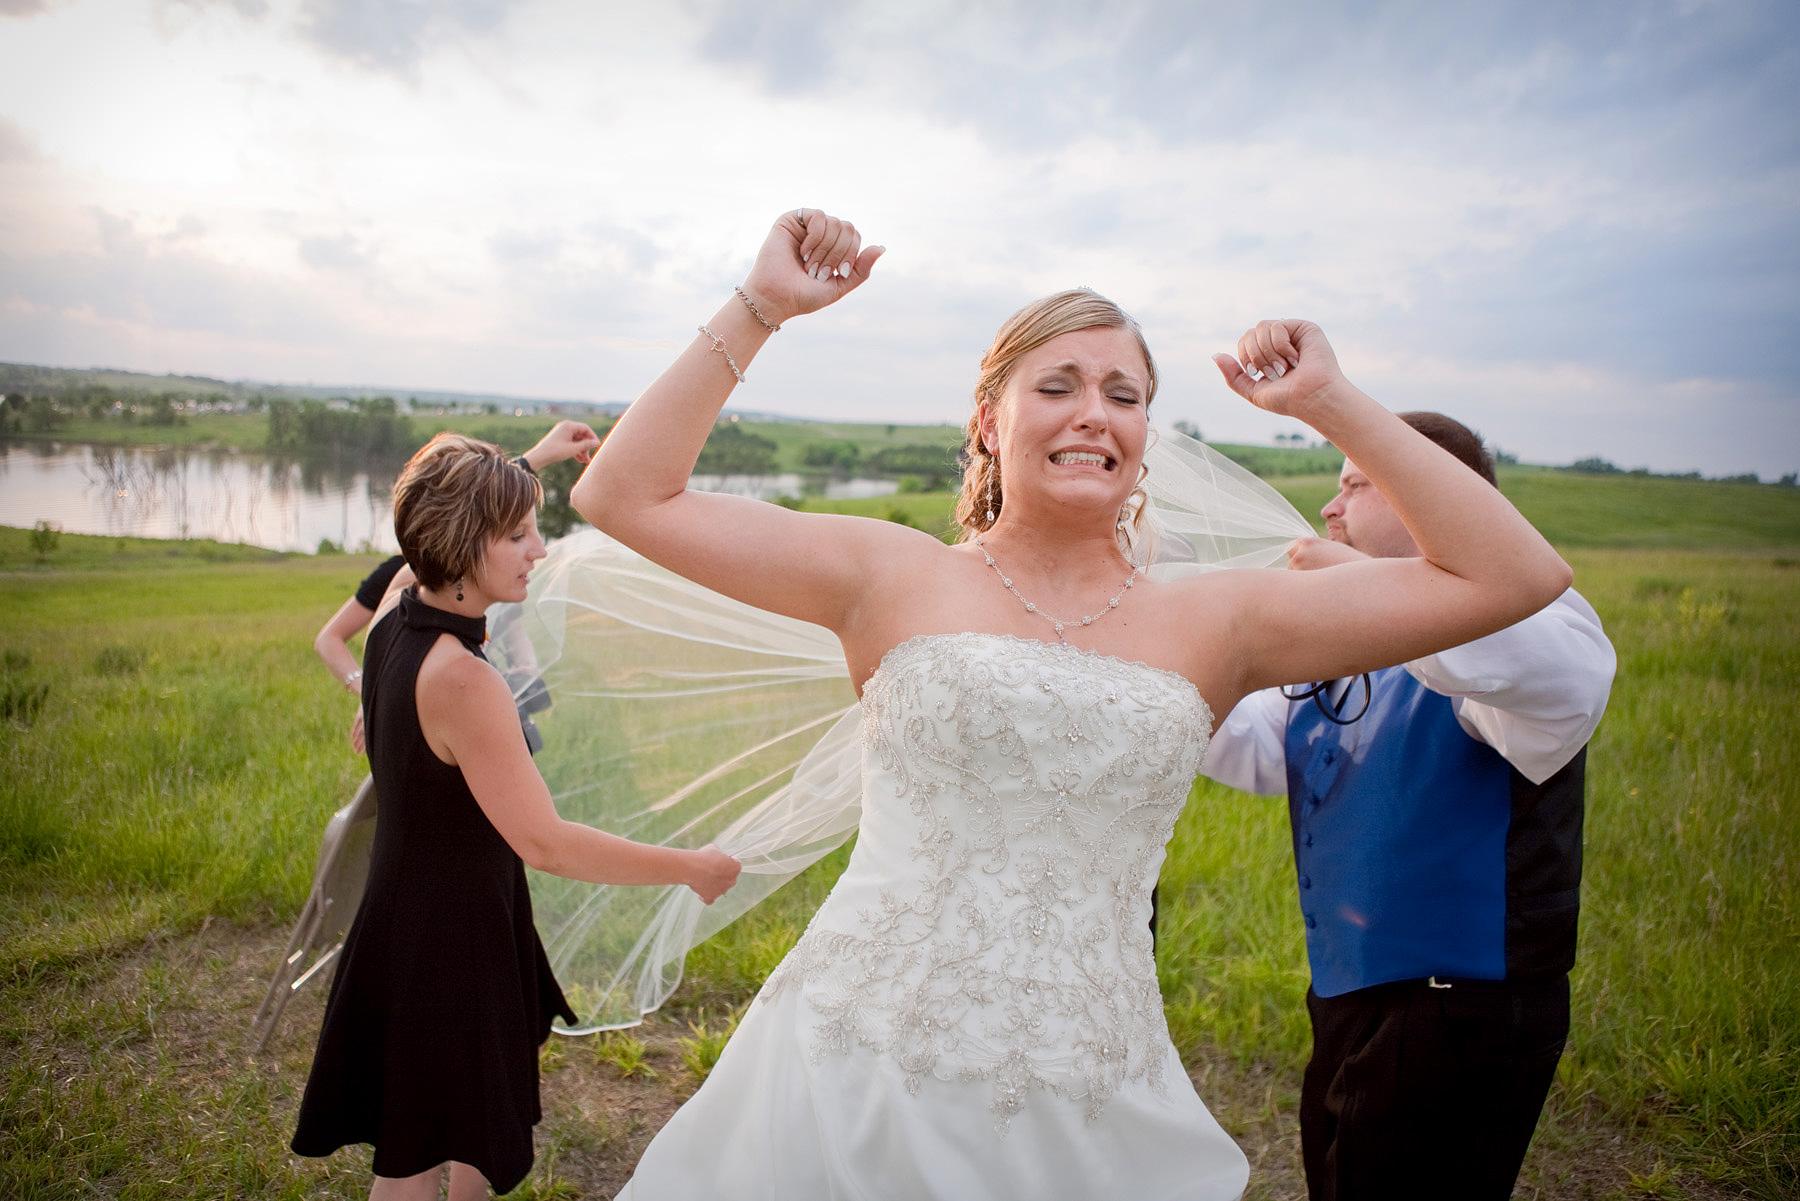 minneapolis-wedding-photography-mark-kegans-337.jpg